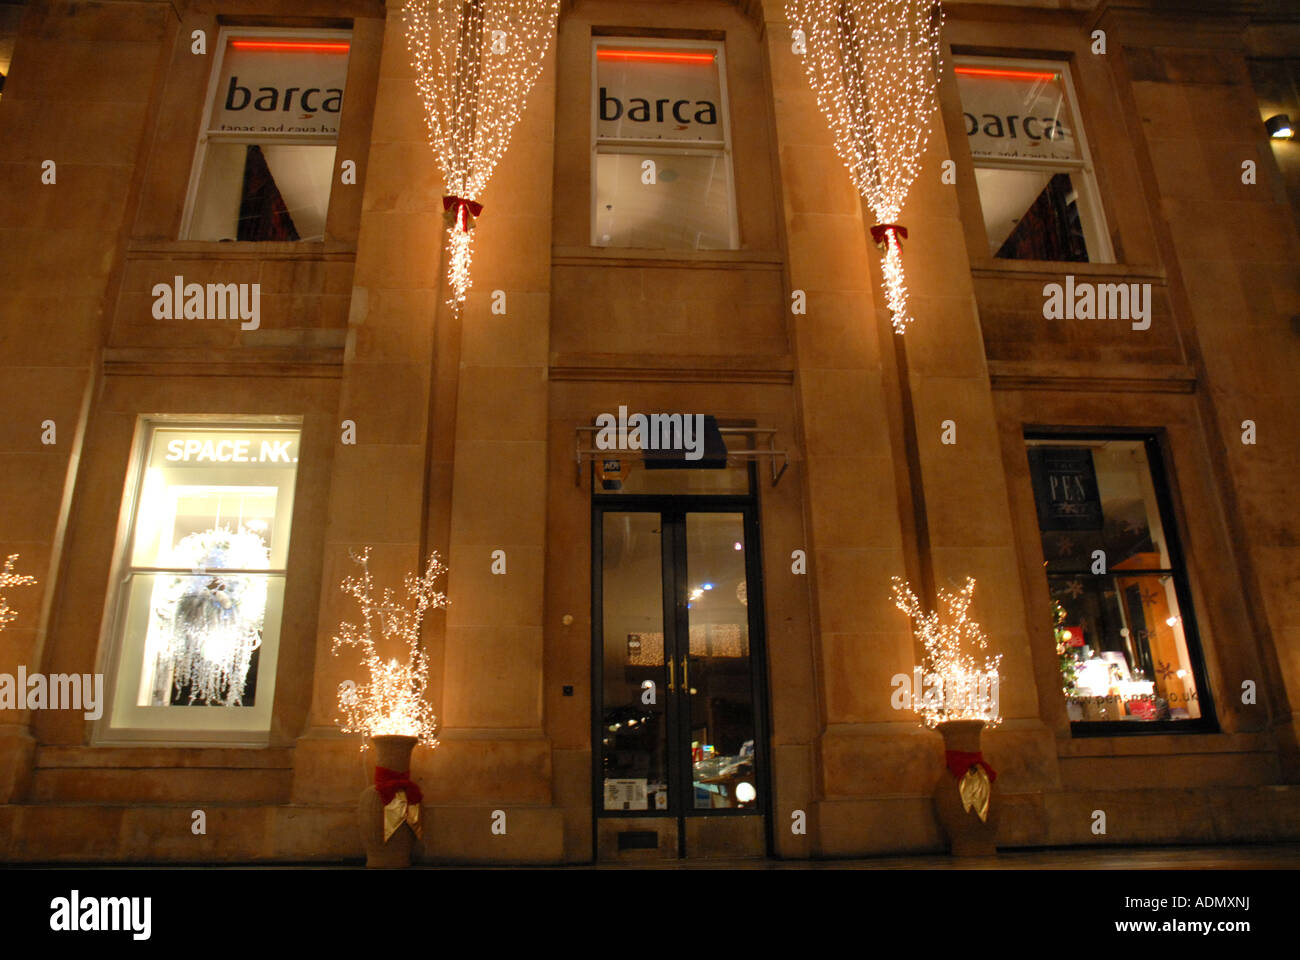 Barca, Tapas Bar,  Princes Square Centre, Buchanan St, Central Glasgow, Scotland. Christmas 2006. - Stock Image